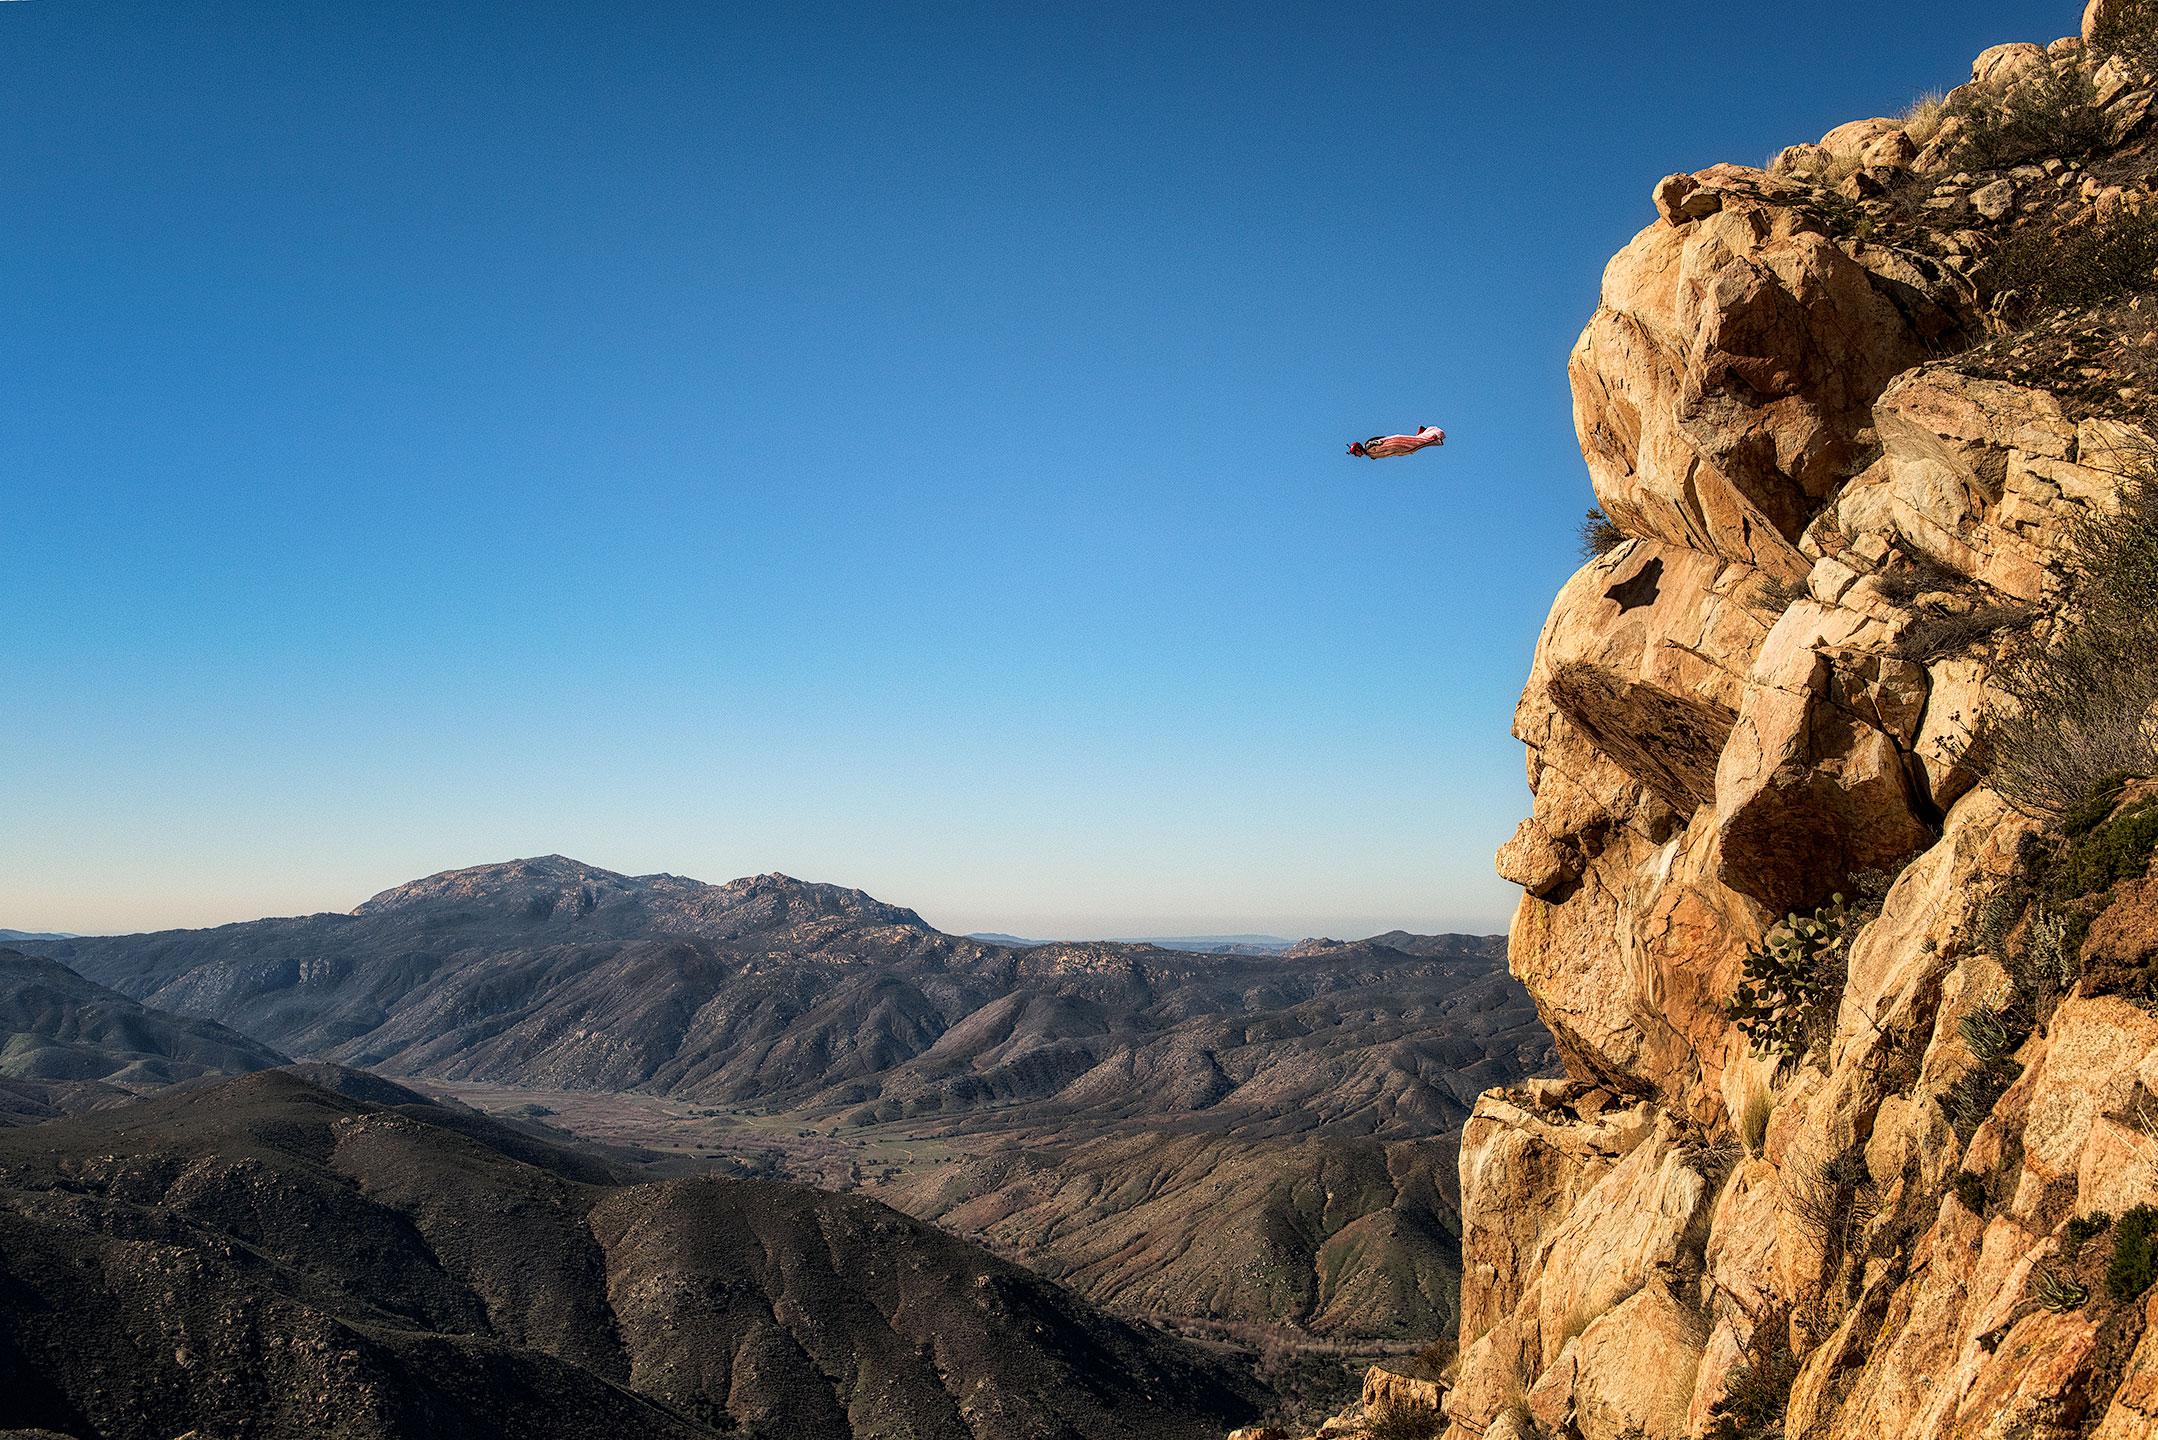 austin-trigg-wing-suit-base-jump-fly-socal-lifestyle-california-adventure-thrill-seeking-san-diego-shadow-mountains.jpg